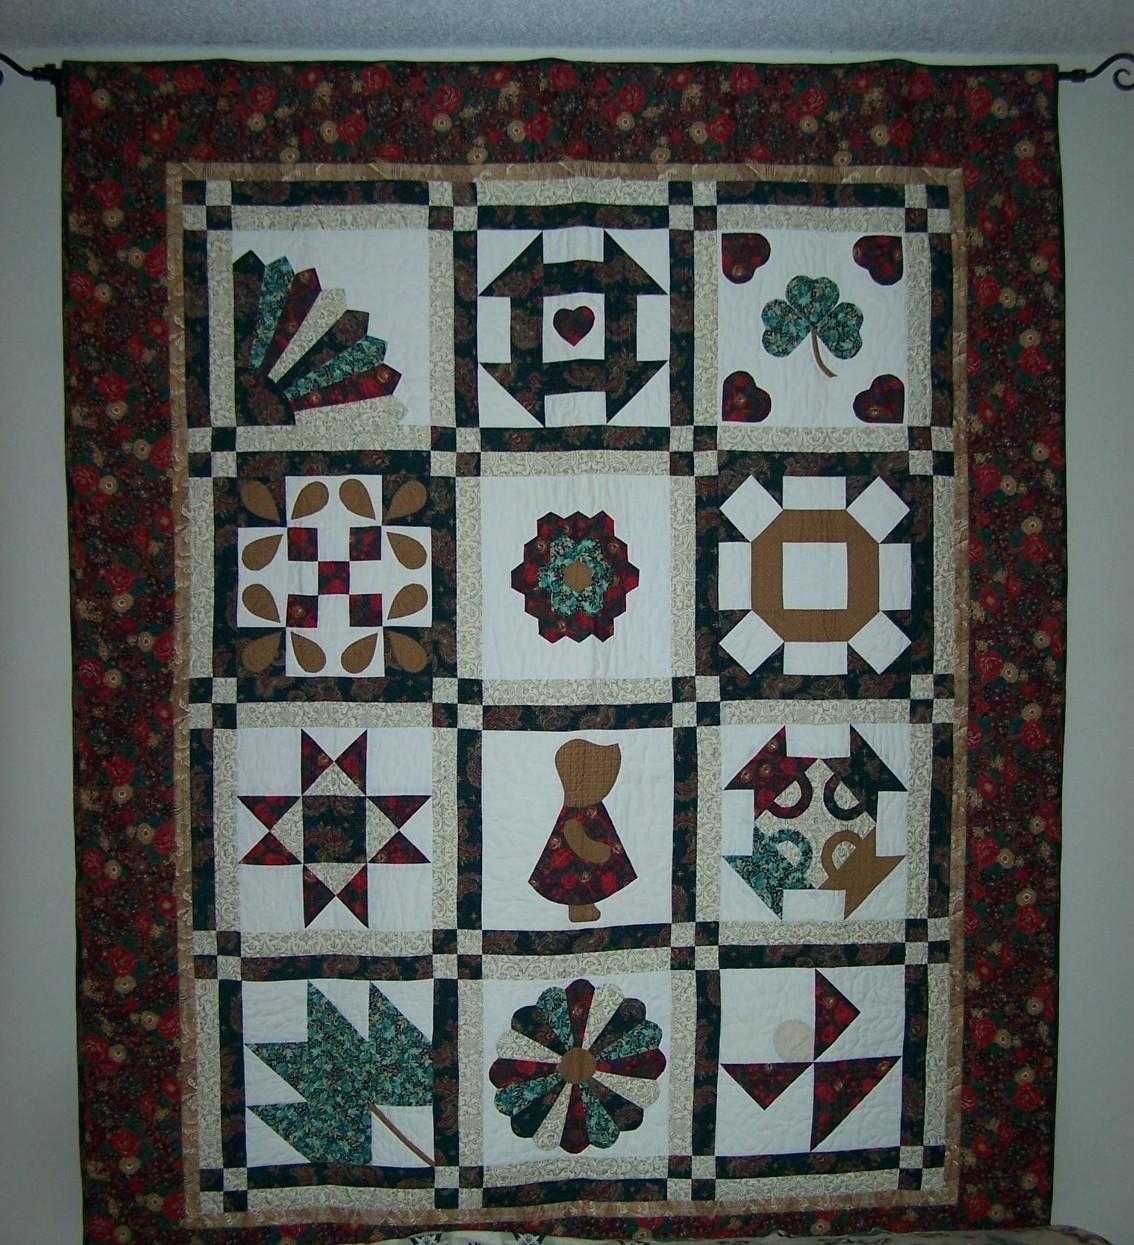 mandrian-garden-a-christmas-sampler-2008